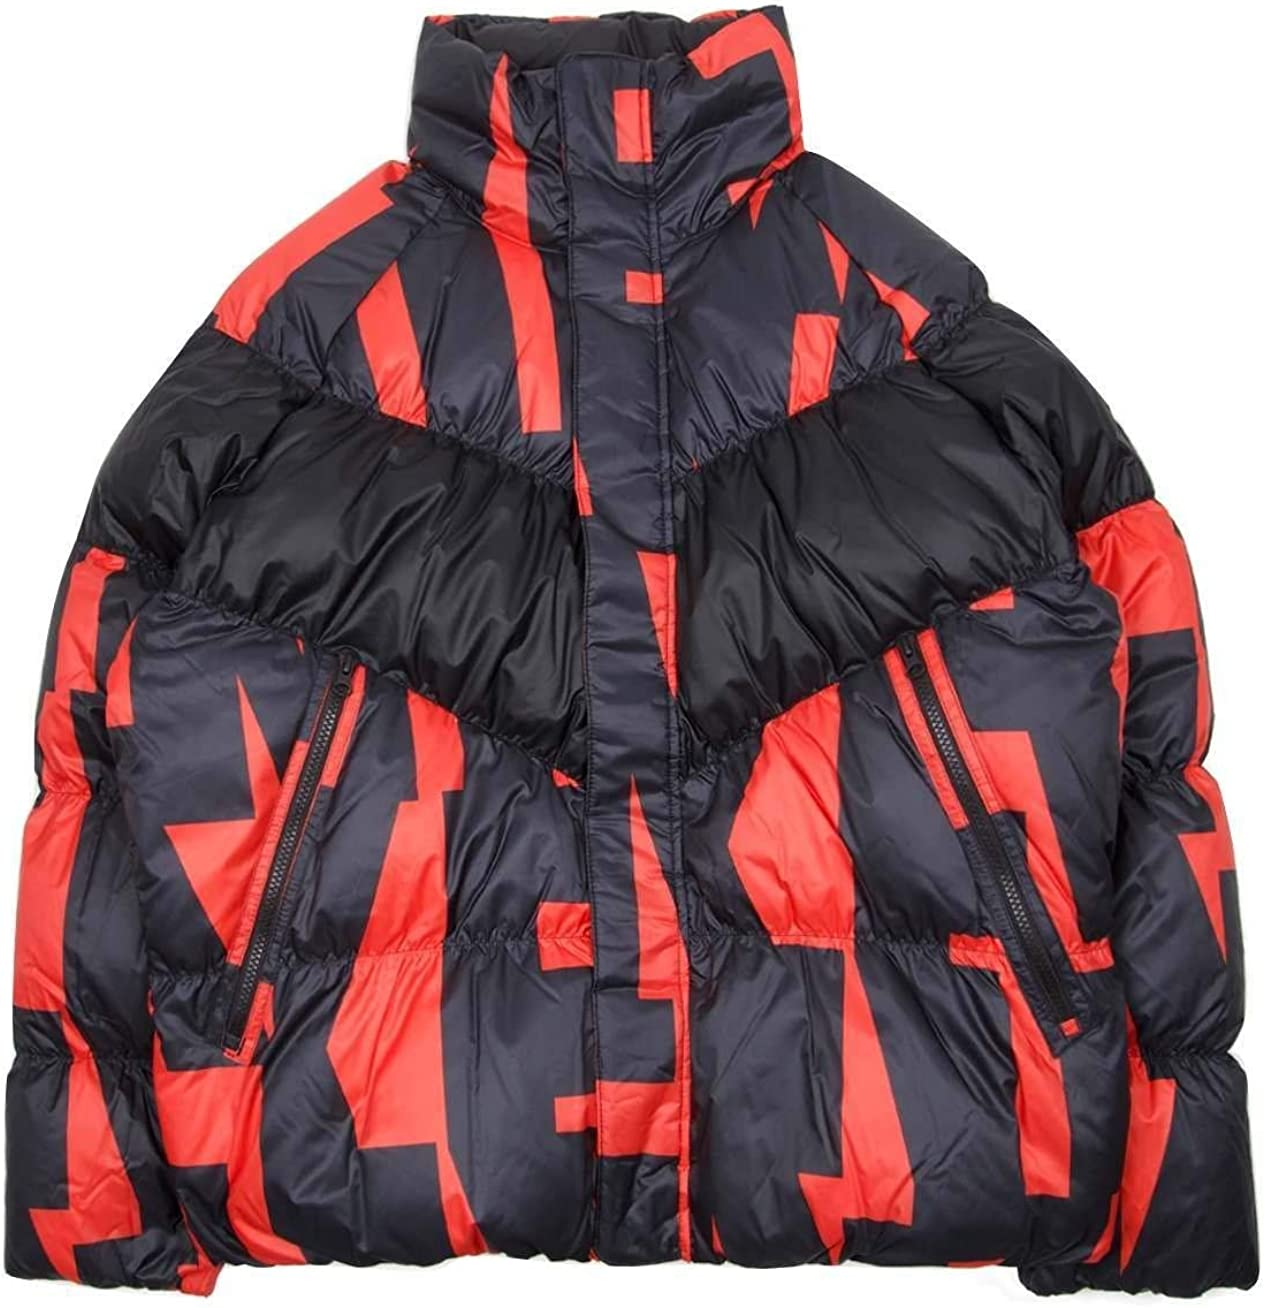 Nike Mens Down Fill Jacket Habanero Red/Black Print Size Large 928889-634